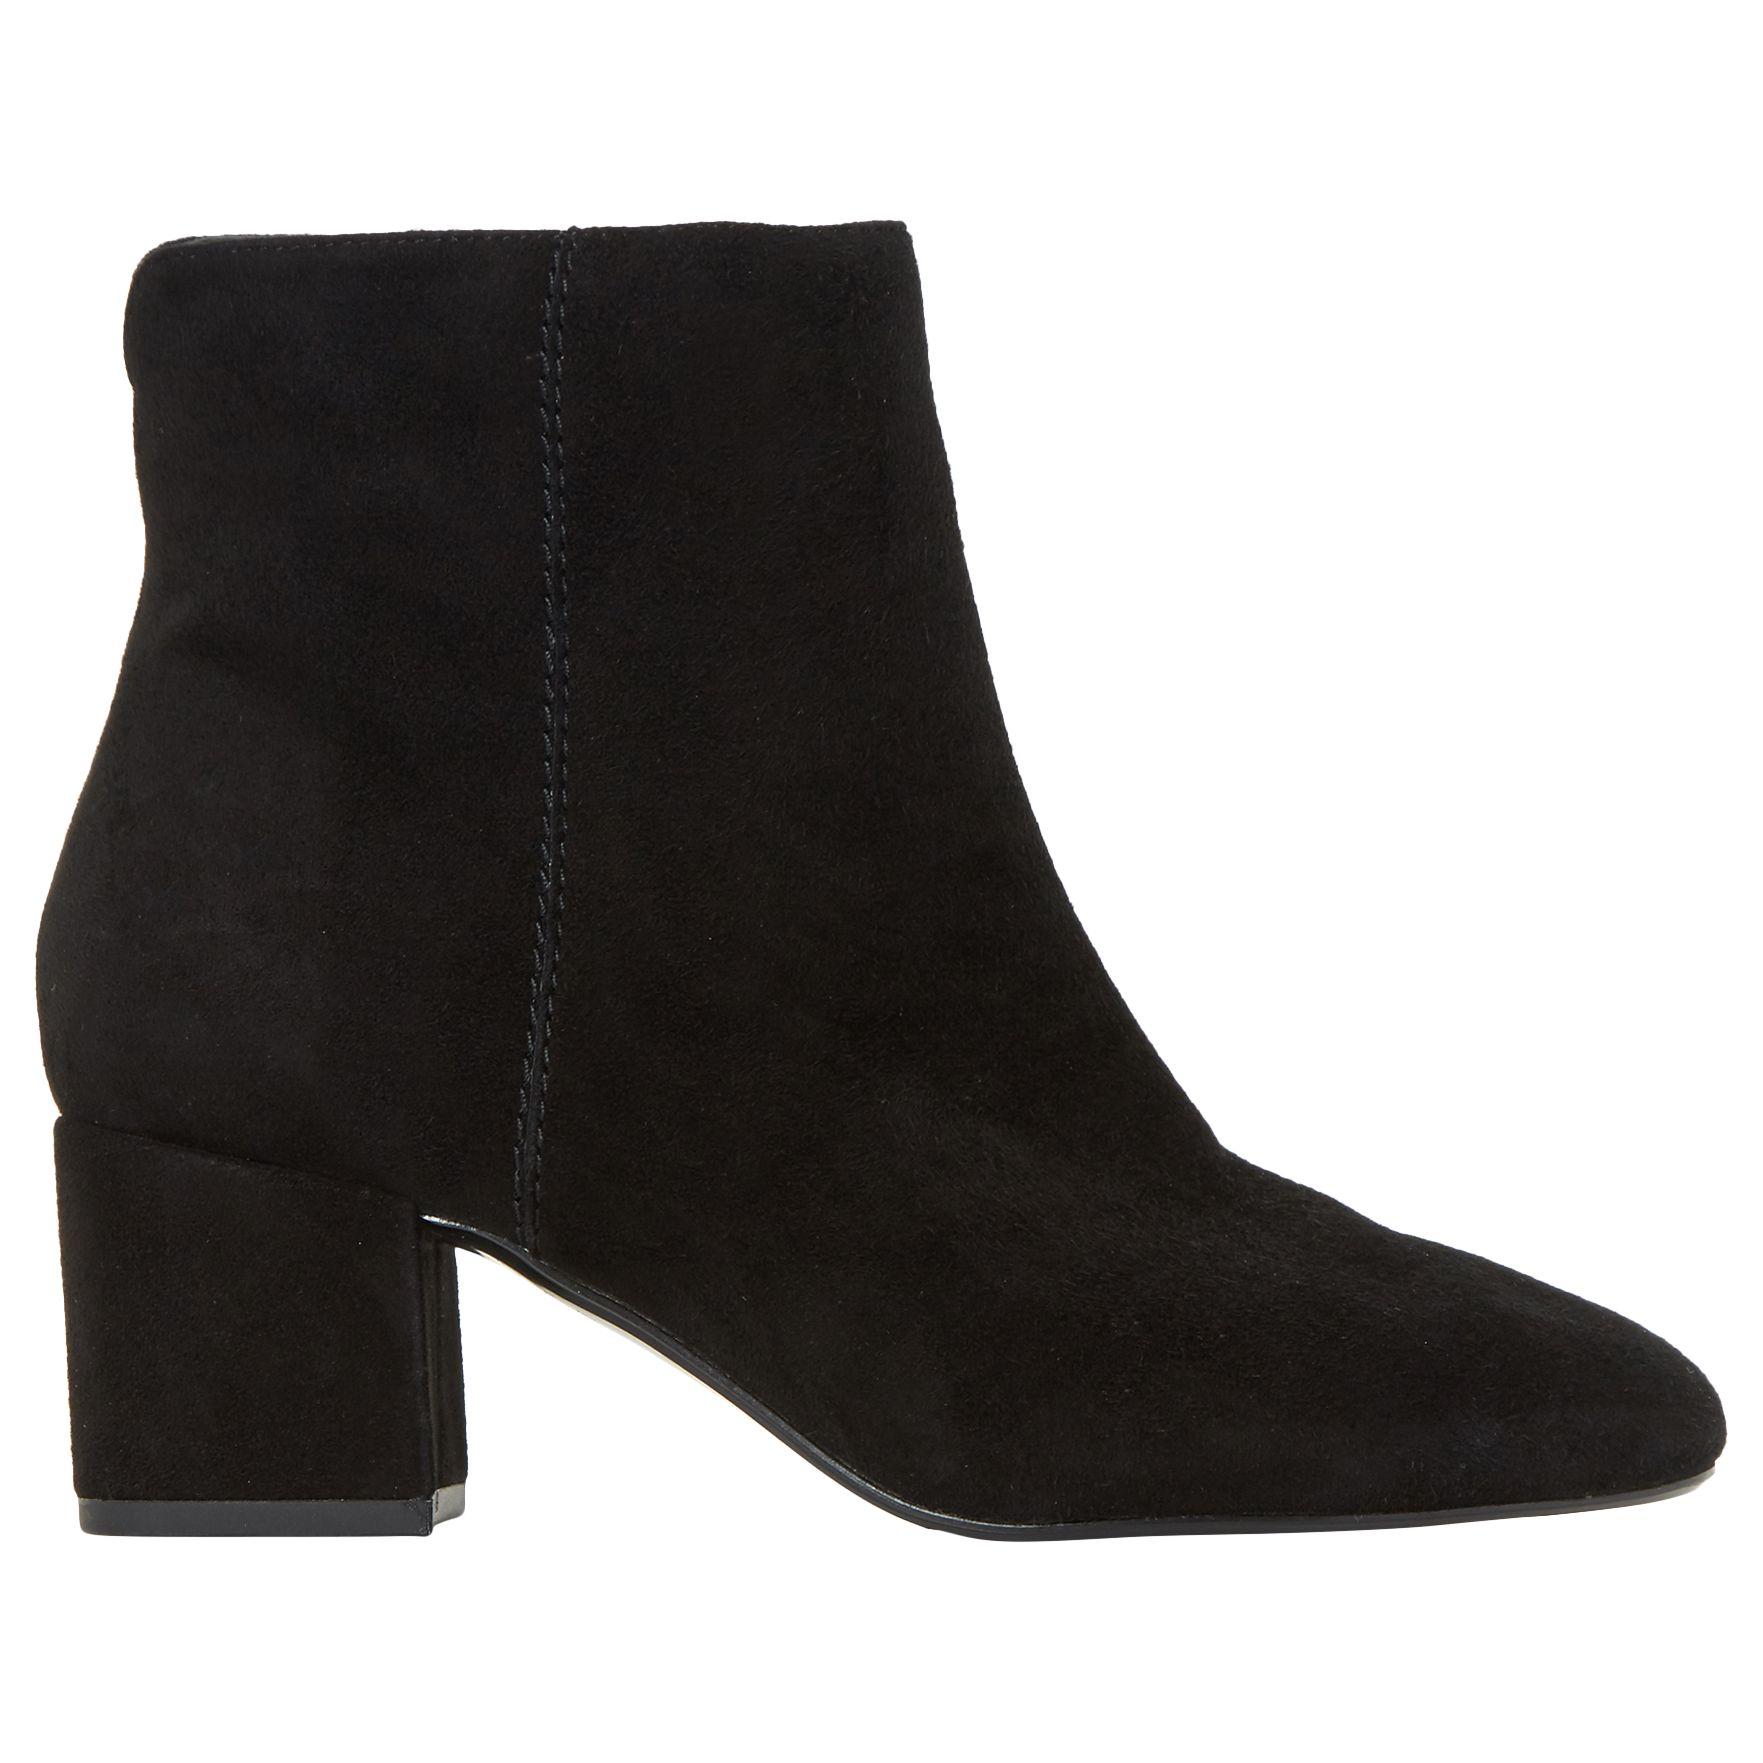 5a789567809 Dune Olyvea Block Heeled Ankle Boots, Black Suede at John Lewis ...